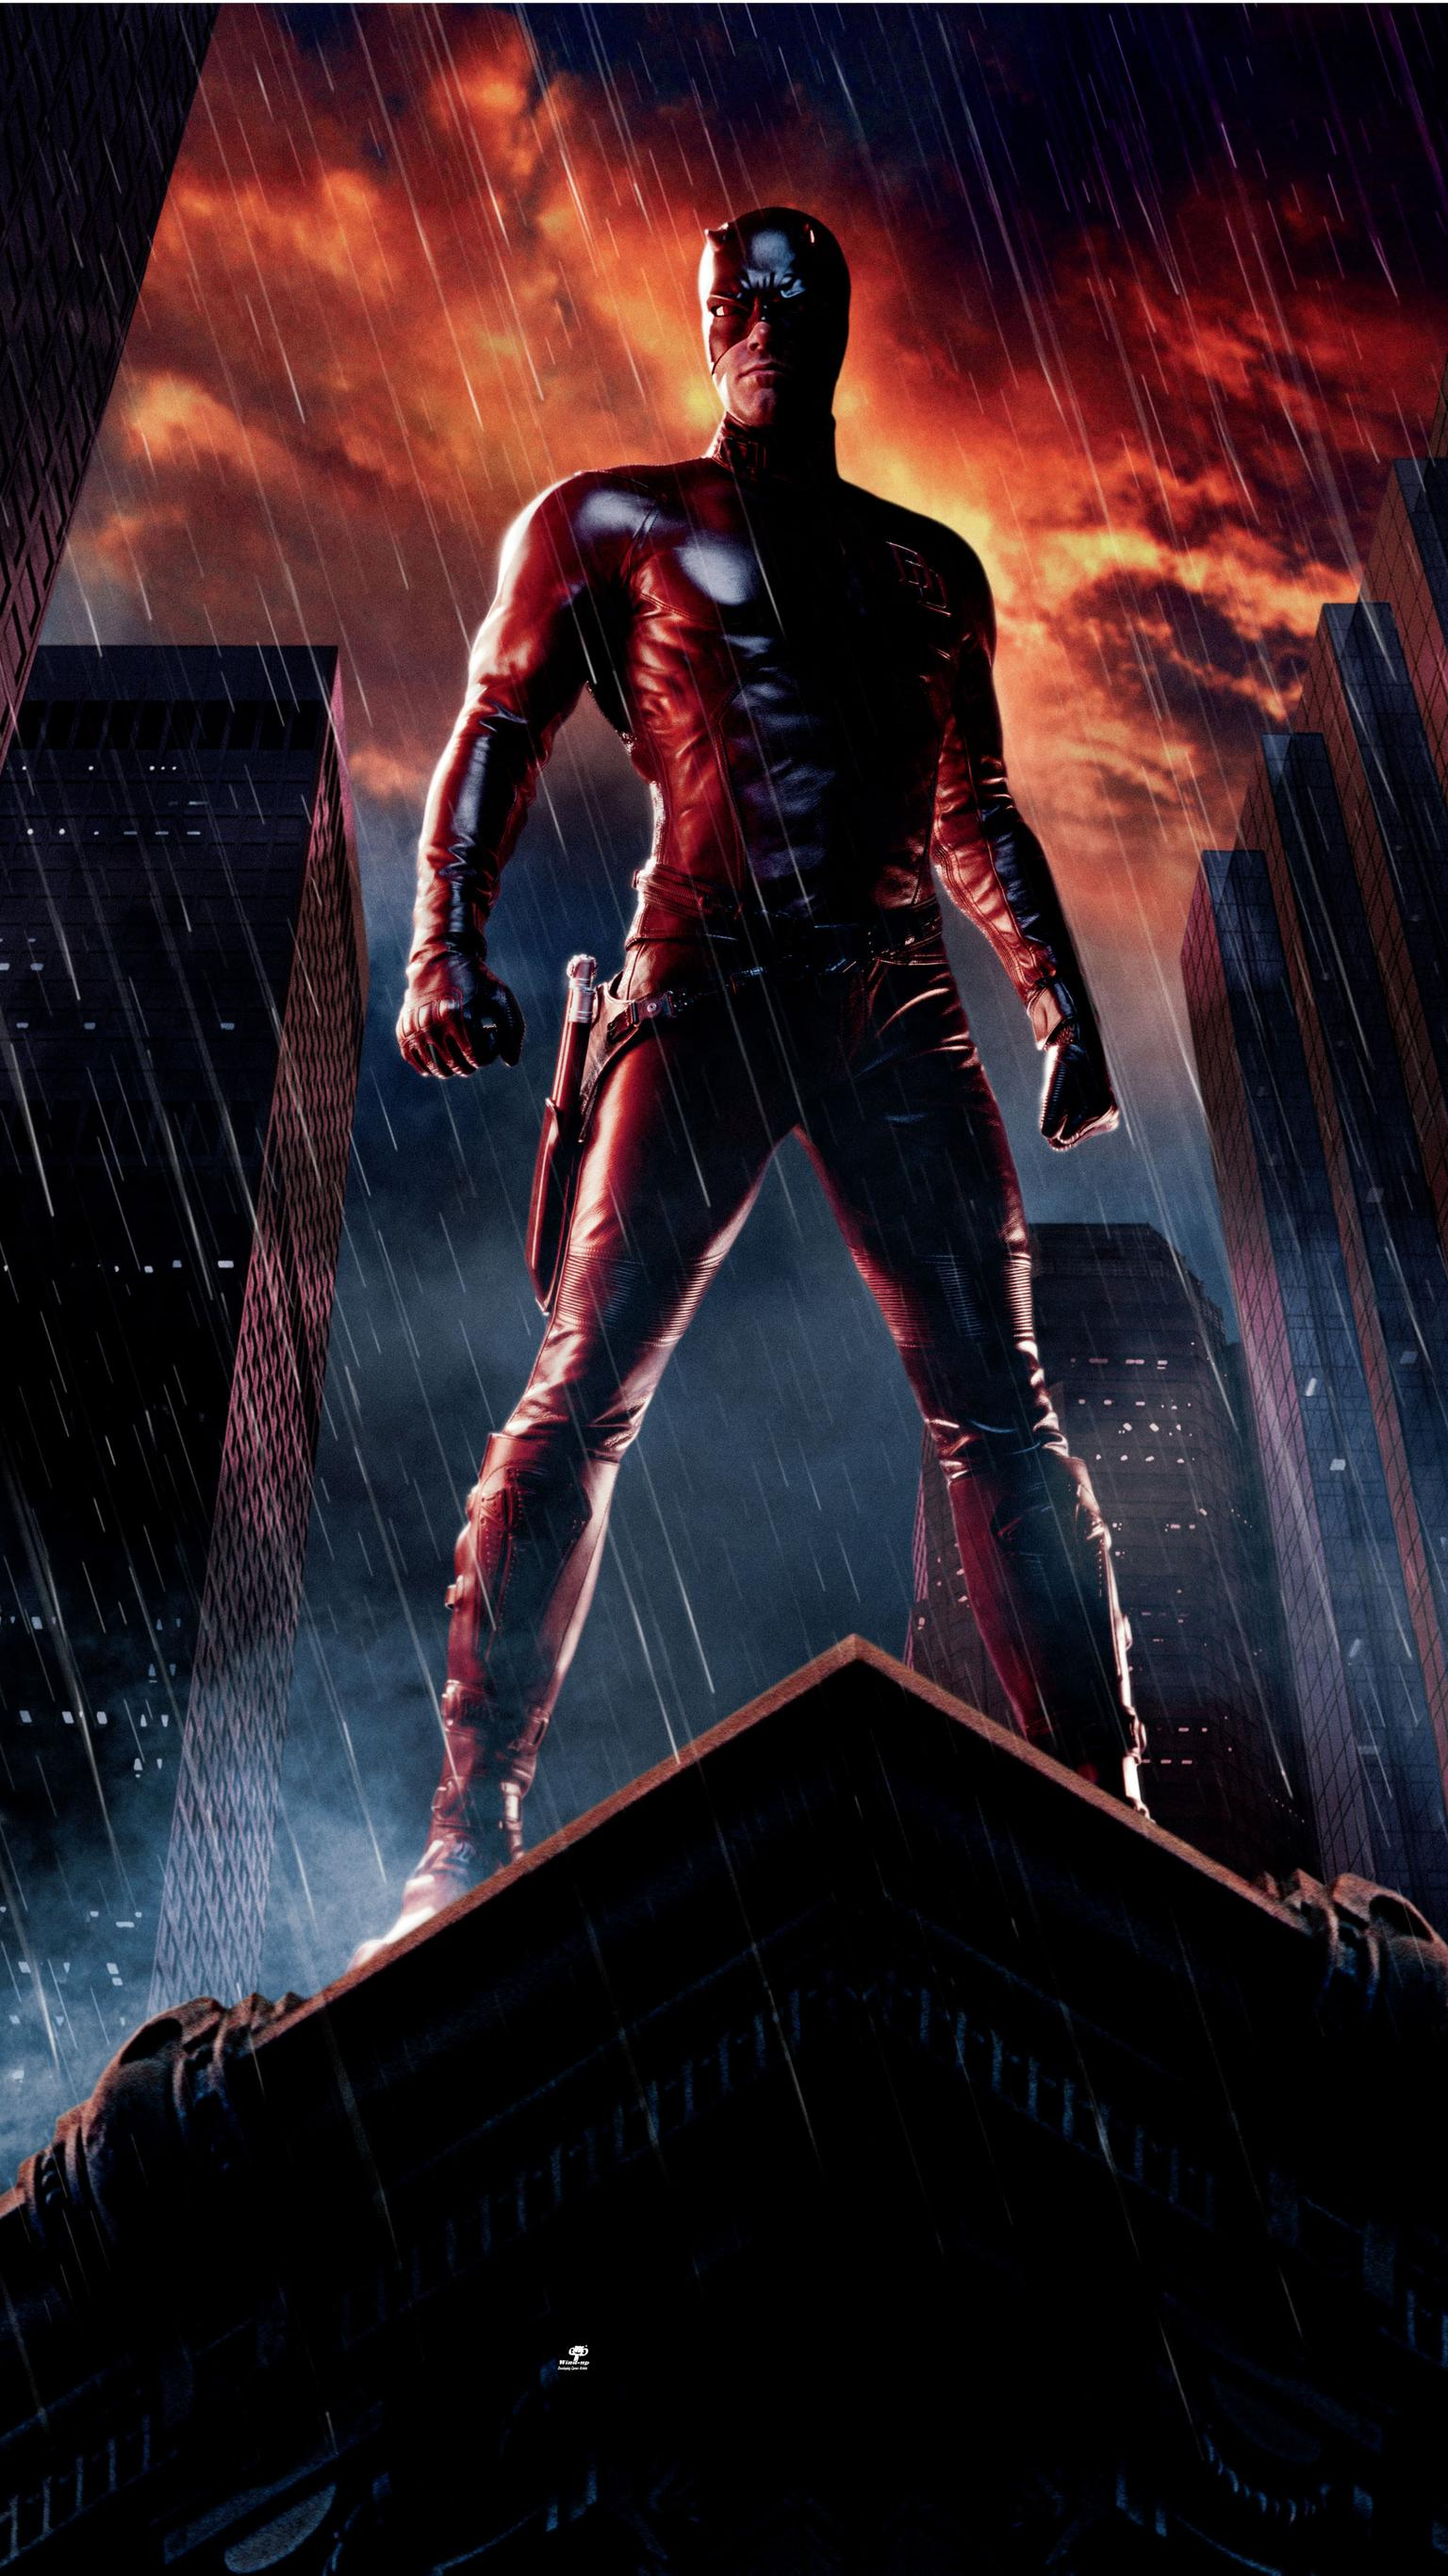 Daredevil Phone Wallpapers Top Free Daredevil Phone Backgrounds Wallpaperaccess